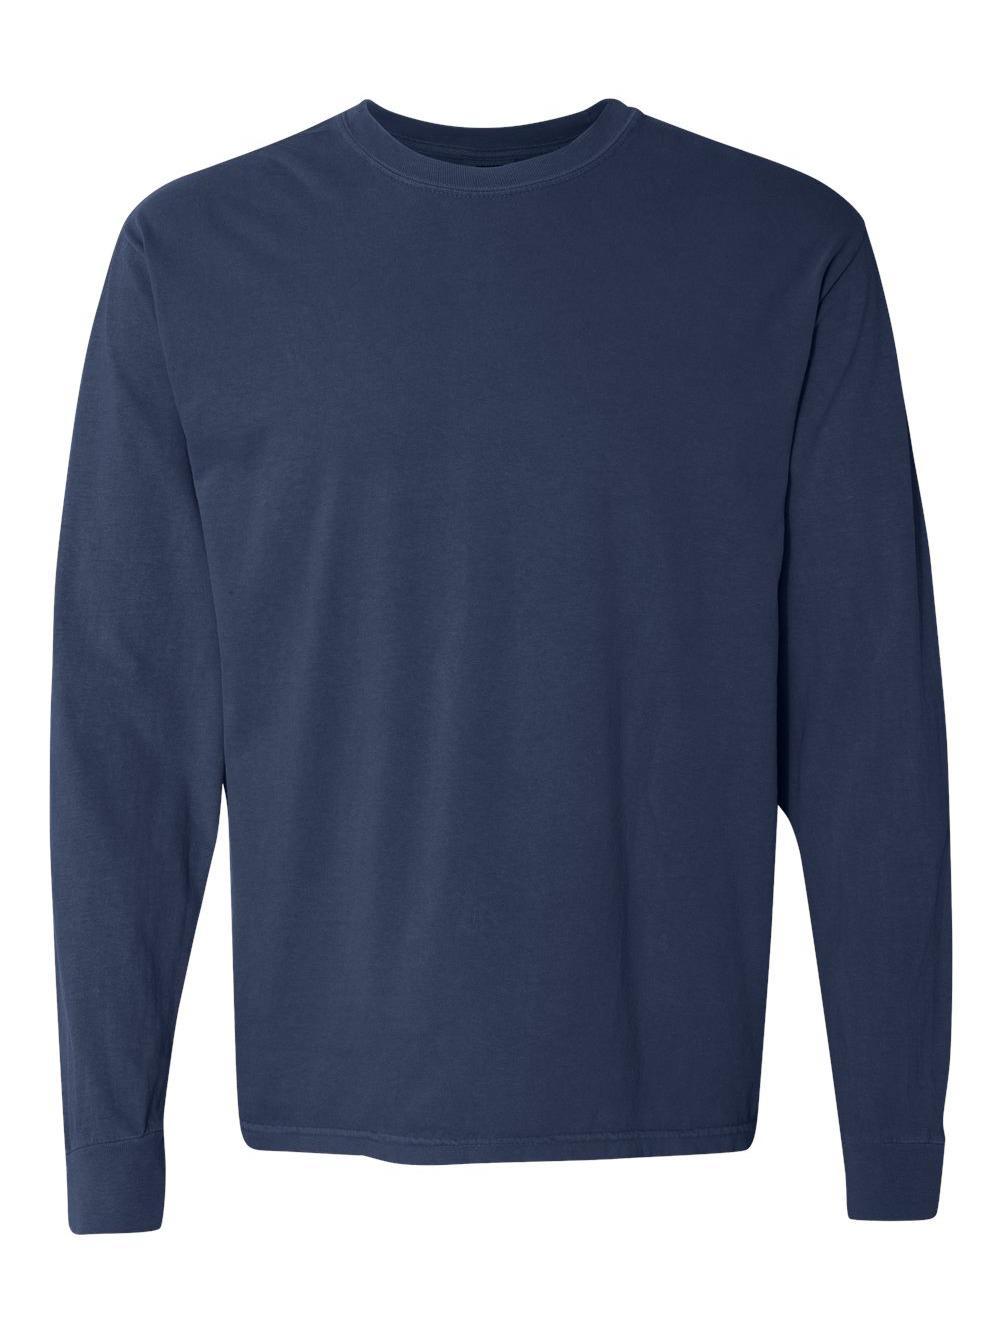 Comfort-Colors-Garment-Dyed-Heavyweight-Ringspun-Long-Sleeve-T-Shirt-6014 thumbnail 63